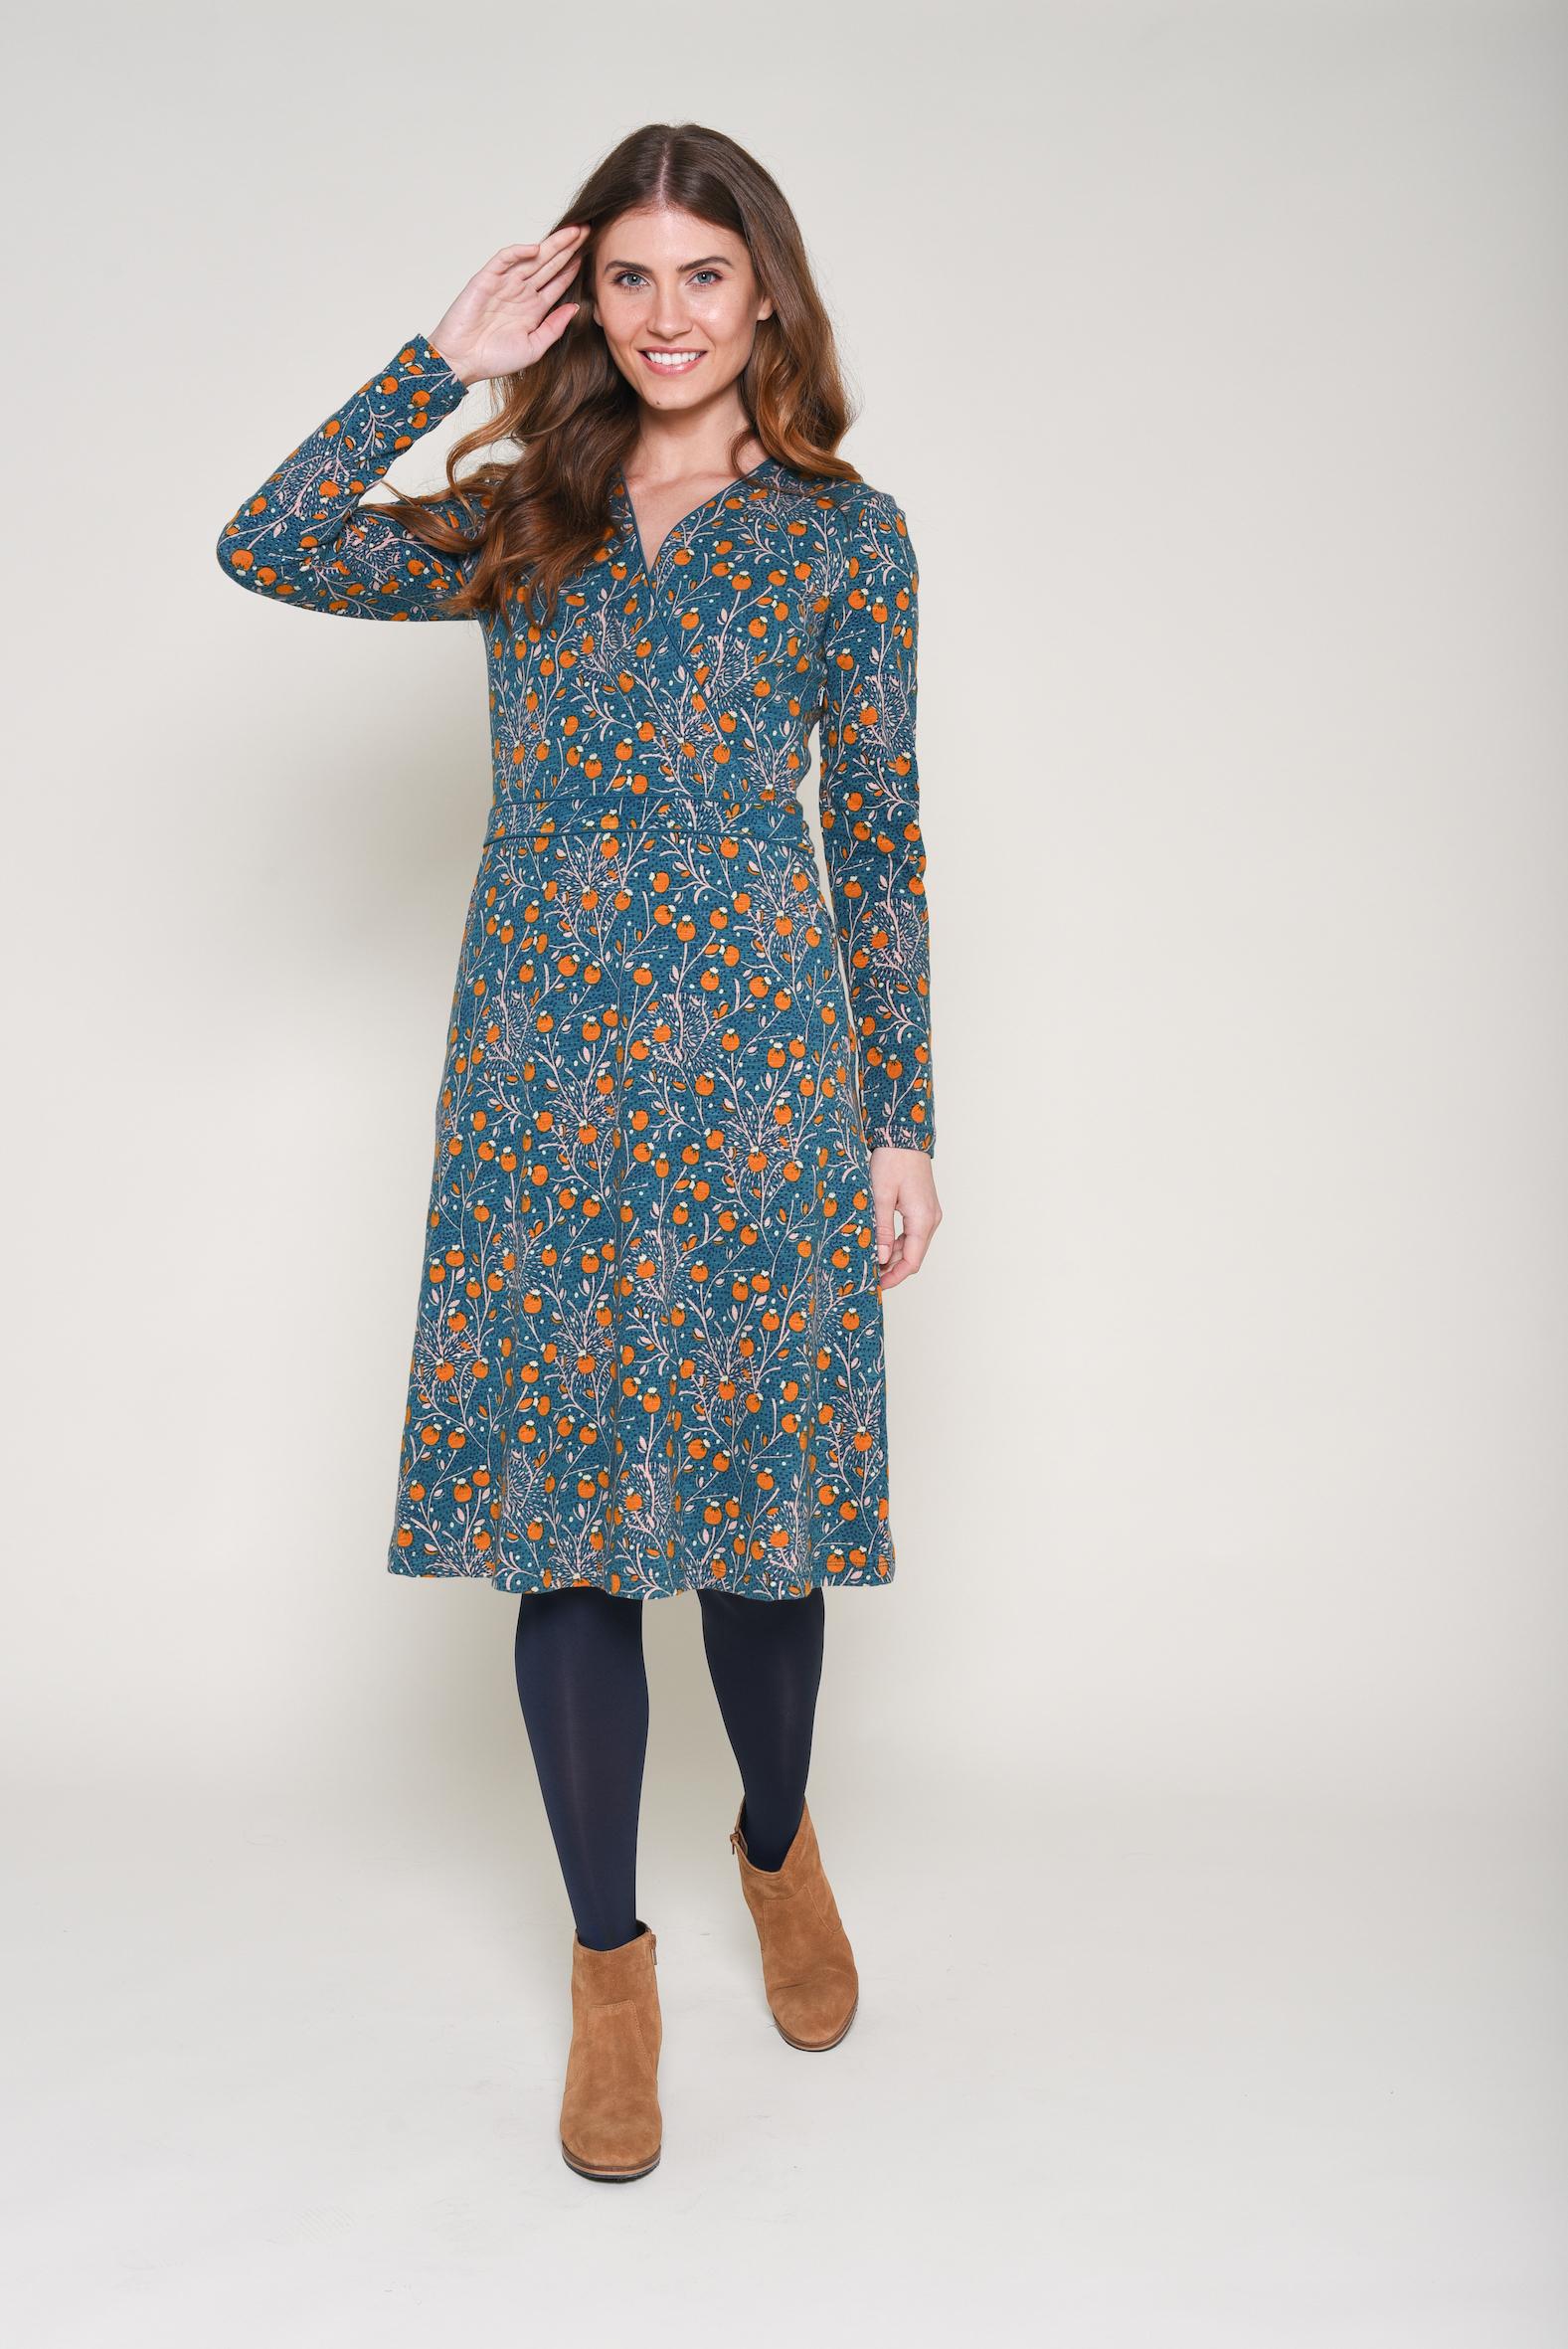 Brakeburn Berry Trail Wrap Dress - size 18 only